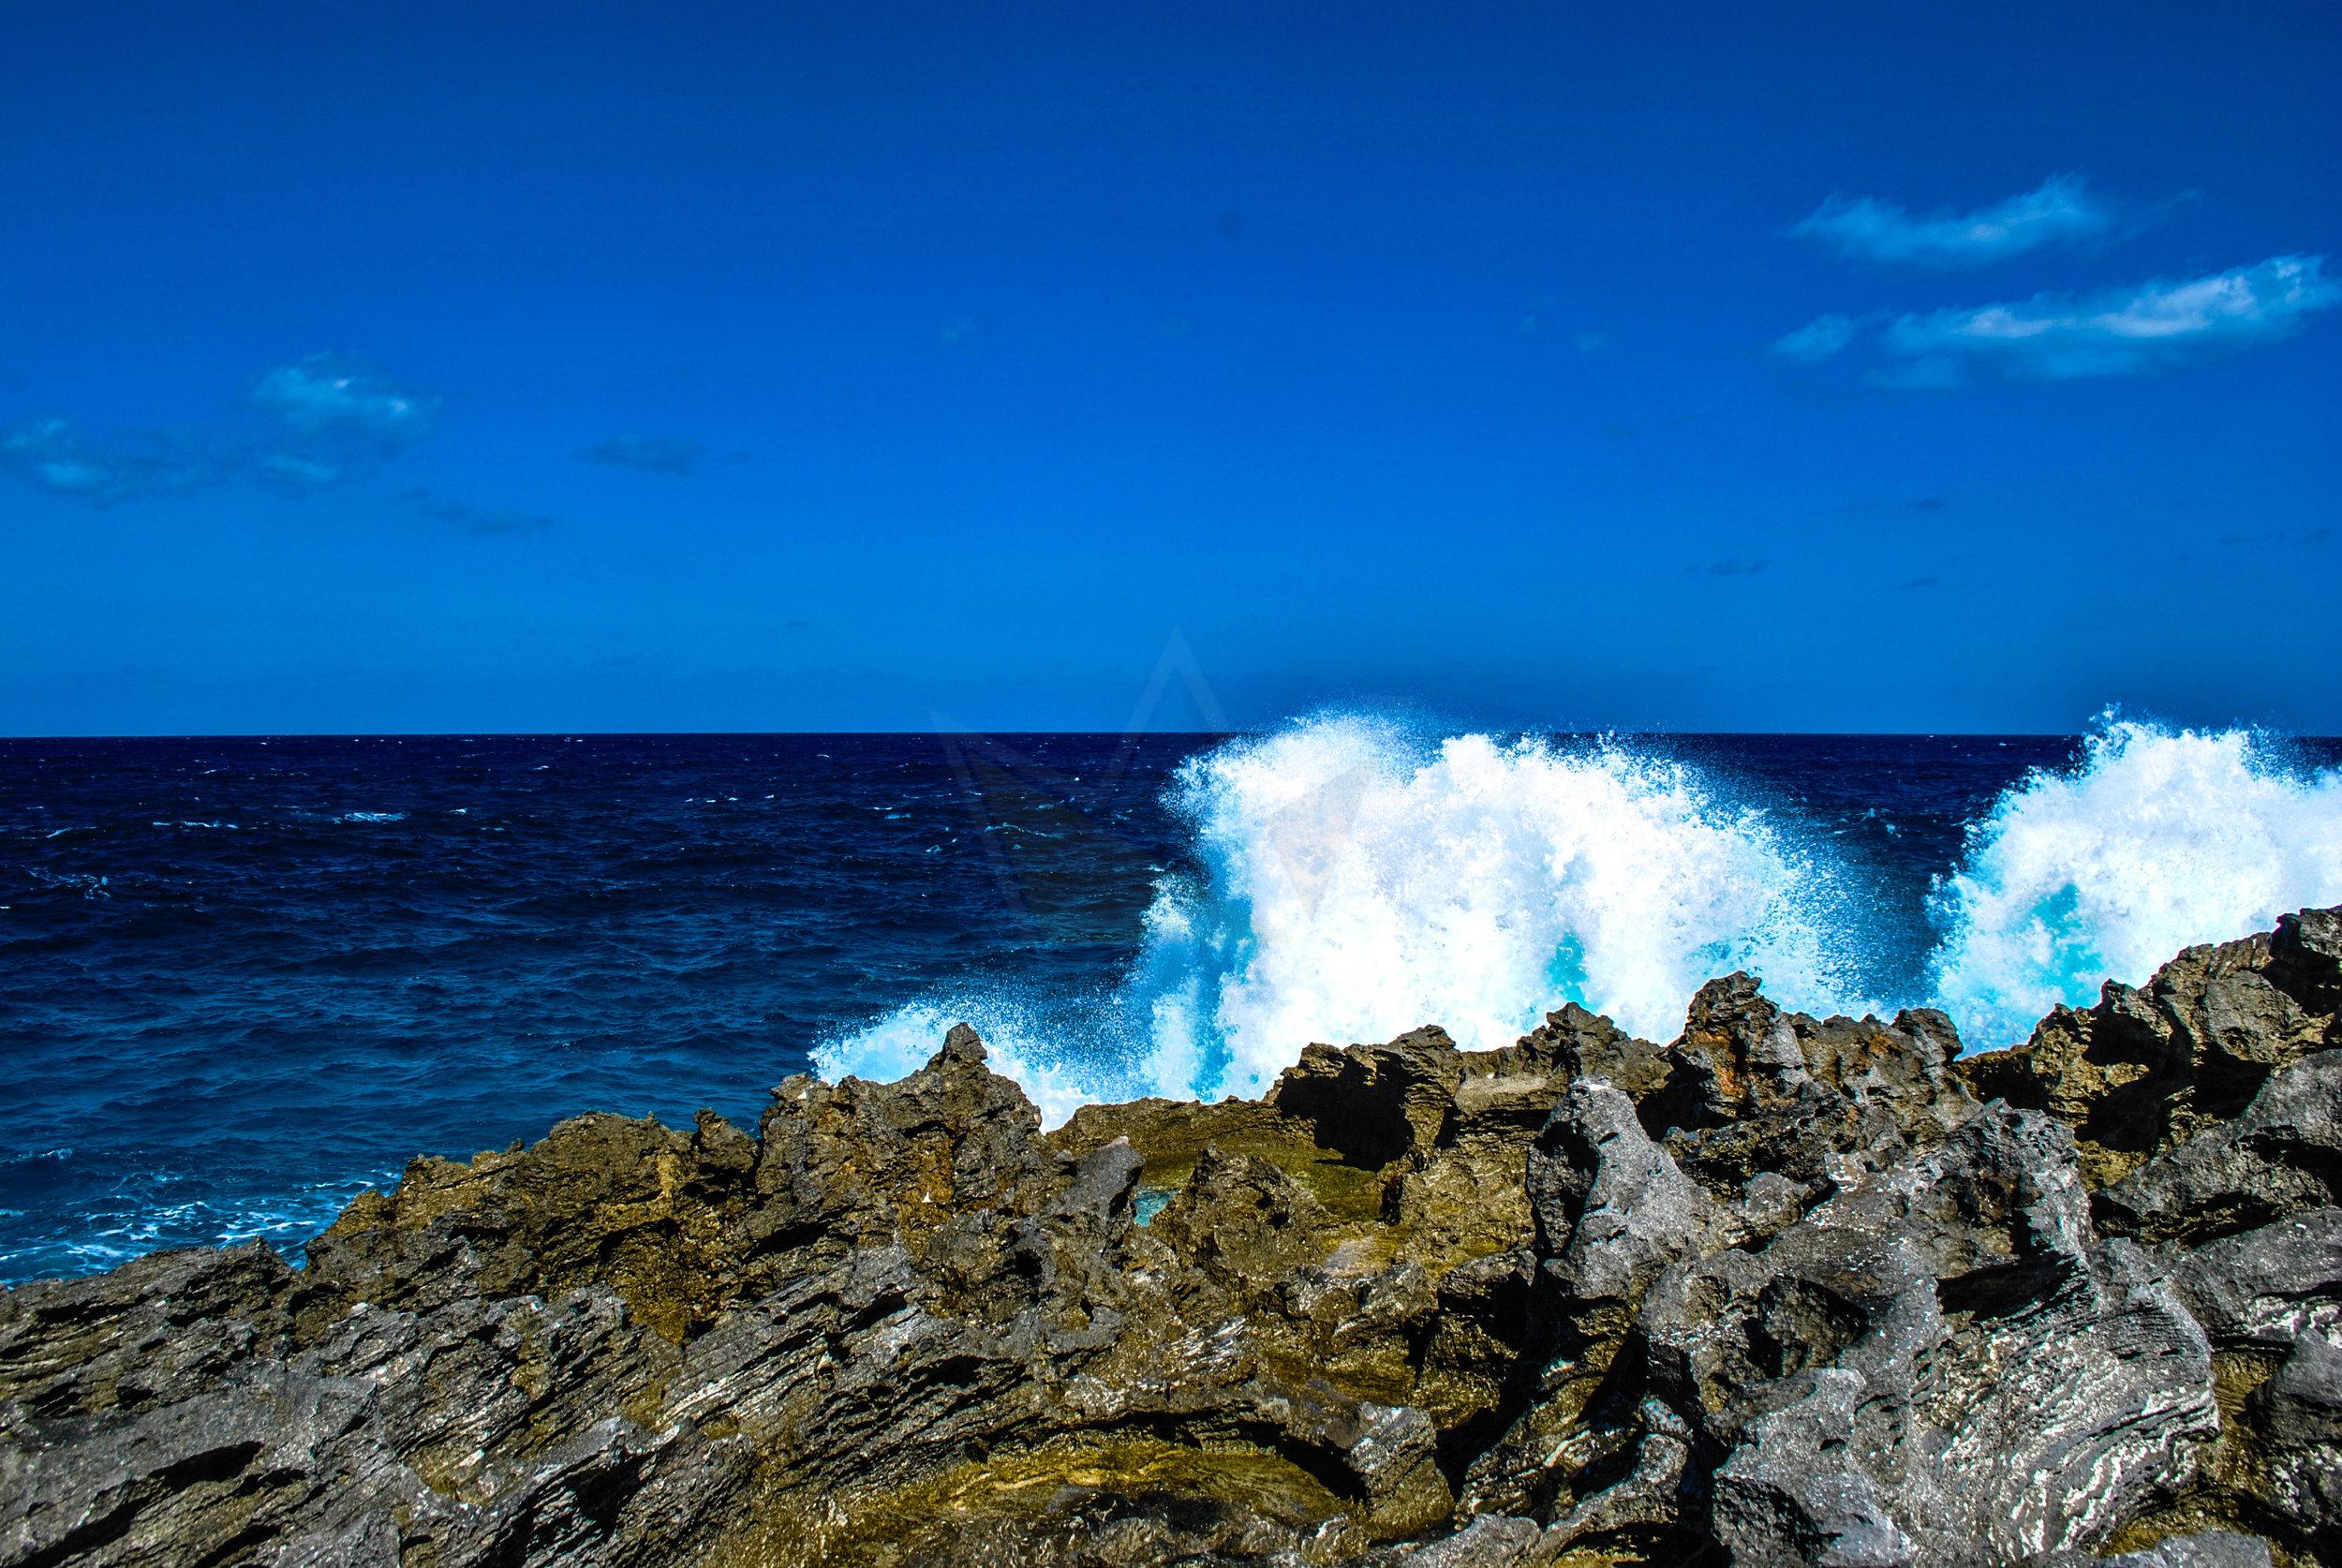 Waves crashing on the Atlantic Coast just south of the Glass Window Bridge